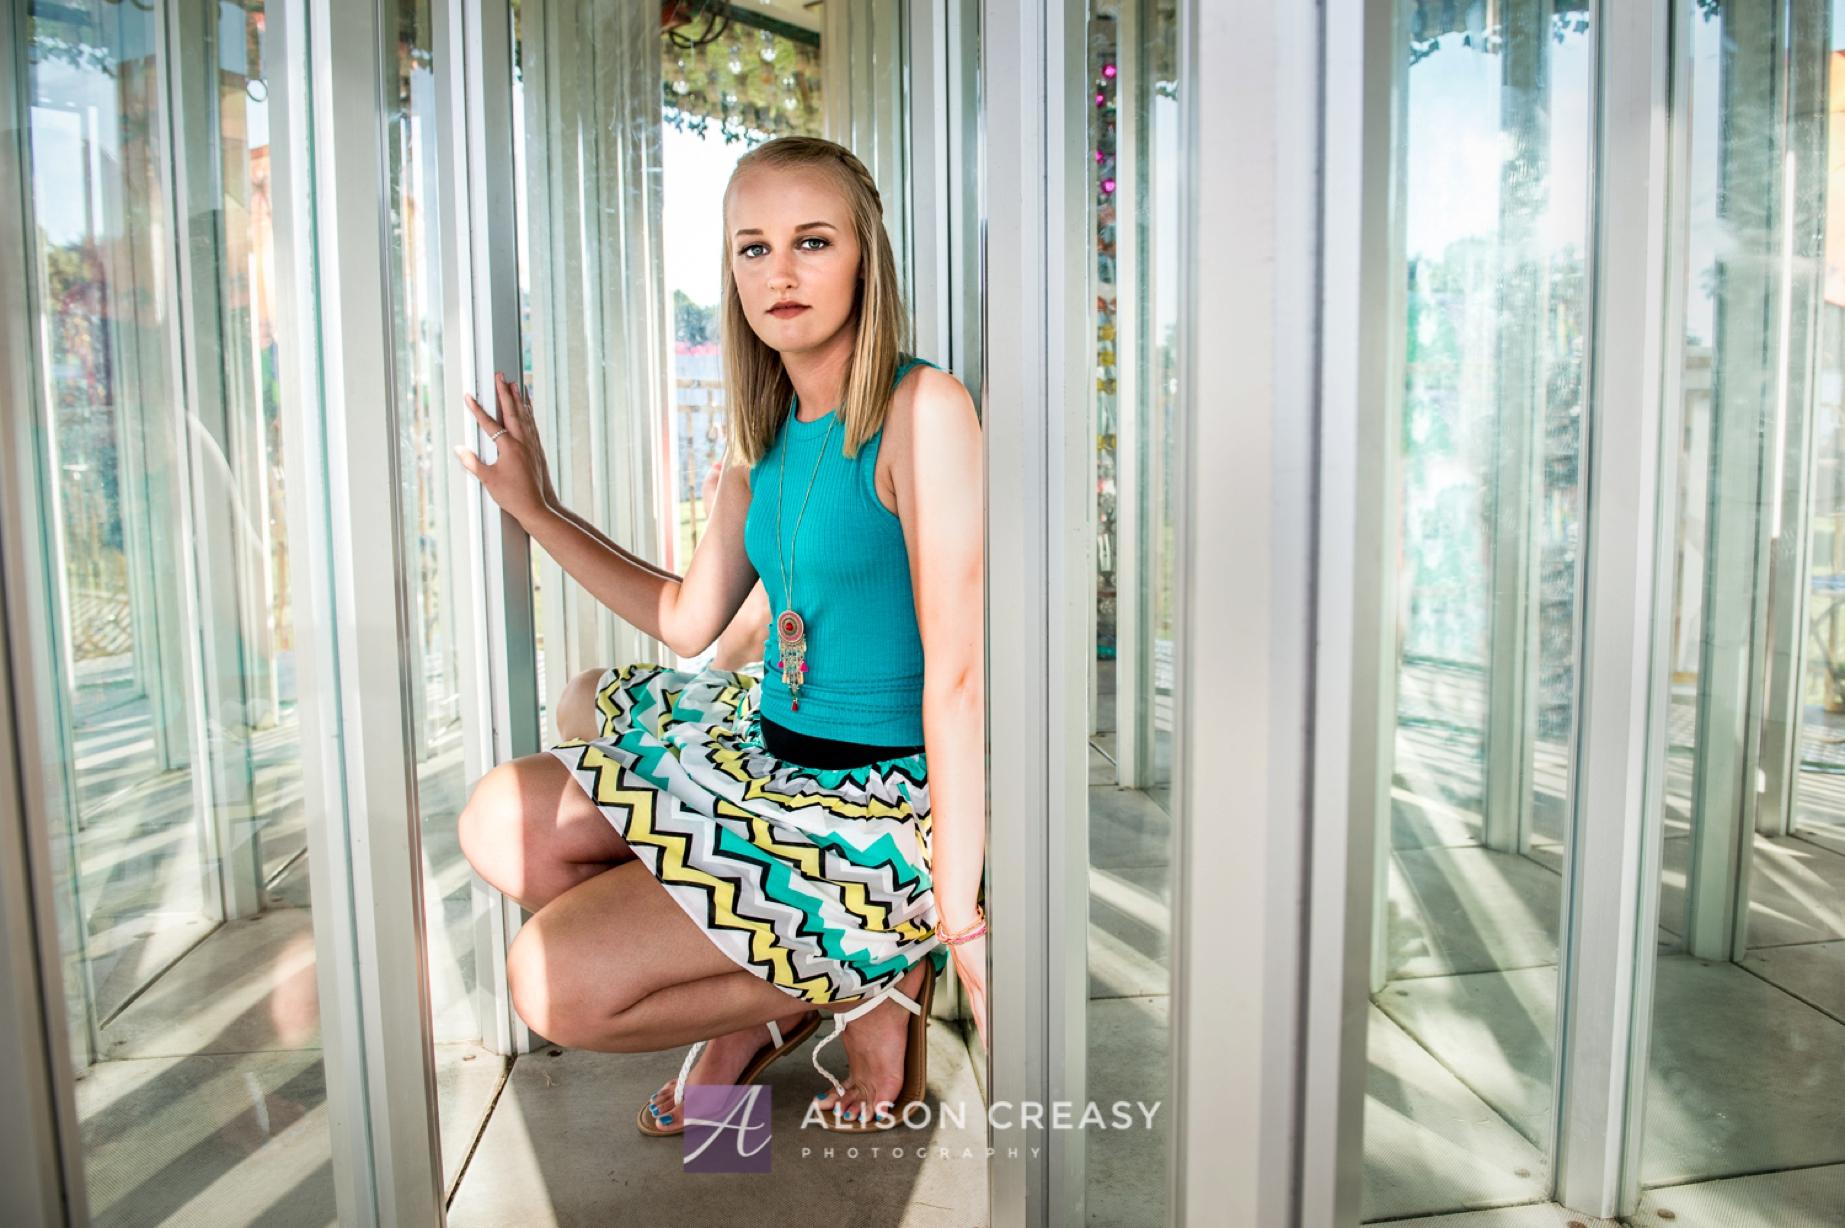 Alison-Creasy-Photography-Lynchburg-VA-Senior- Photographer_0017.jpg